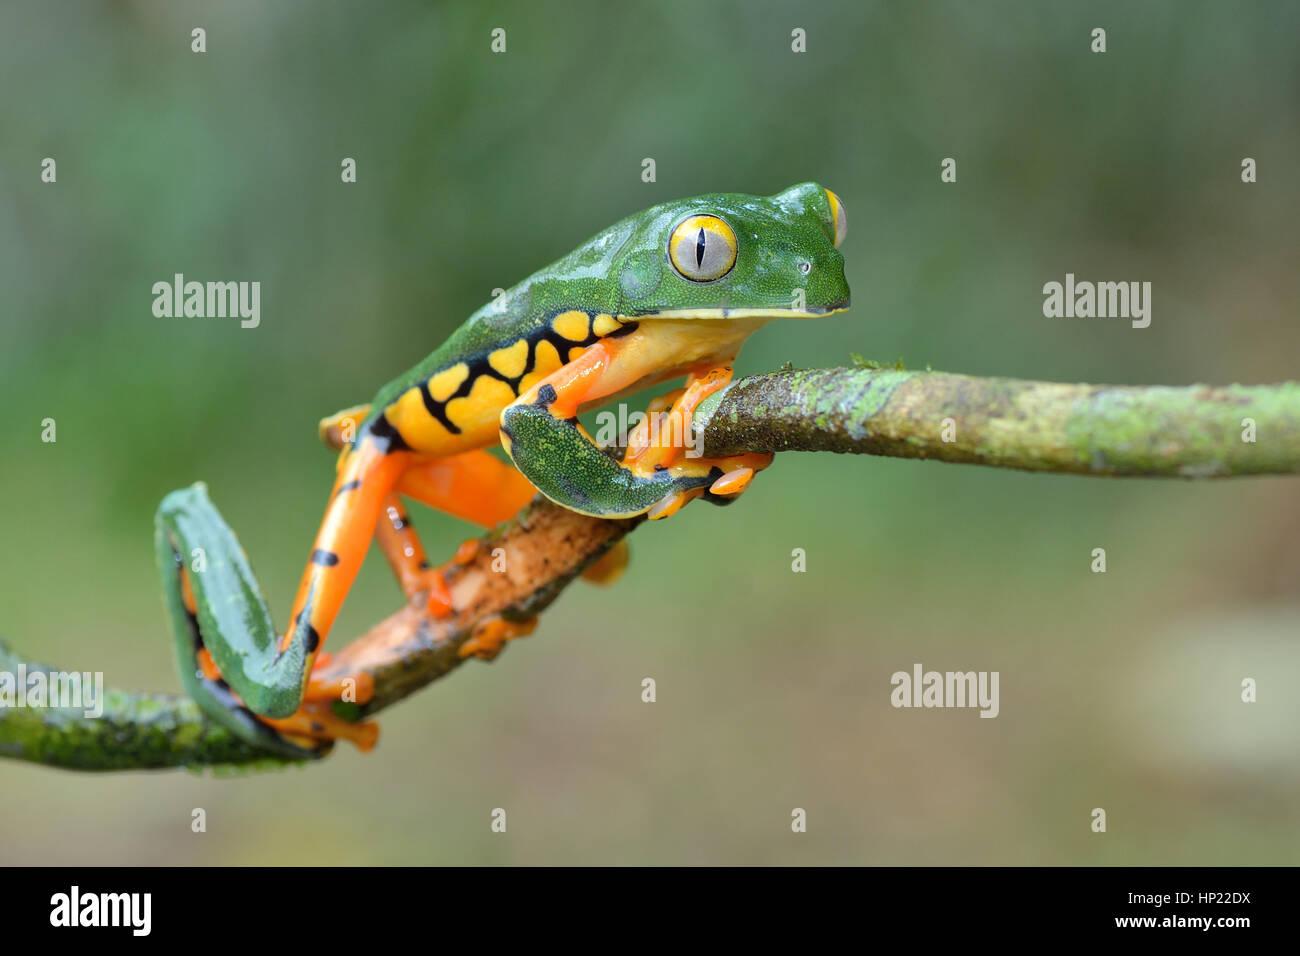 Un raro espléndida hoja rana en Costa Rica Bosque lluvioso de bajura Imagen De Stock